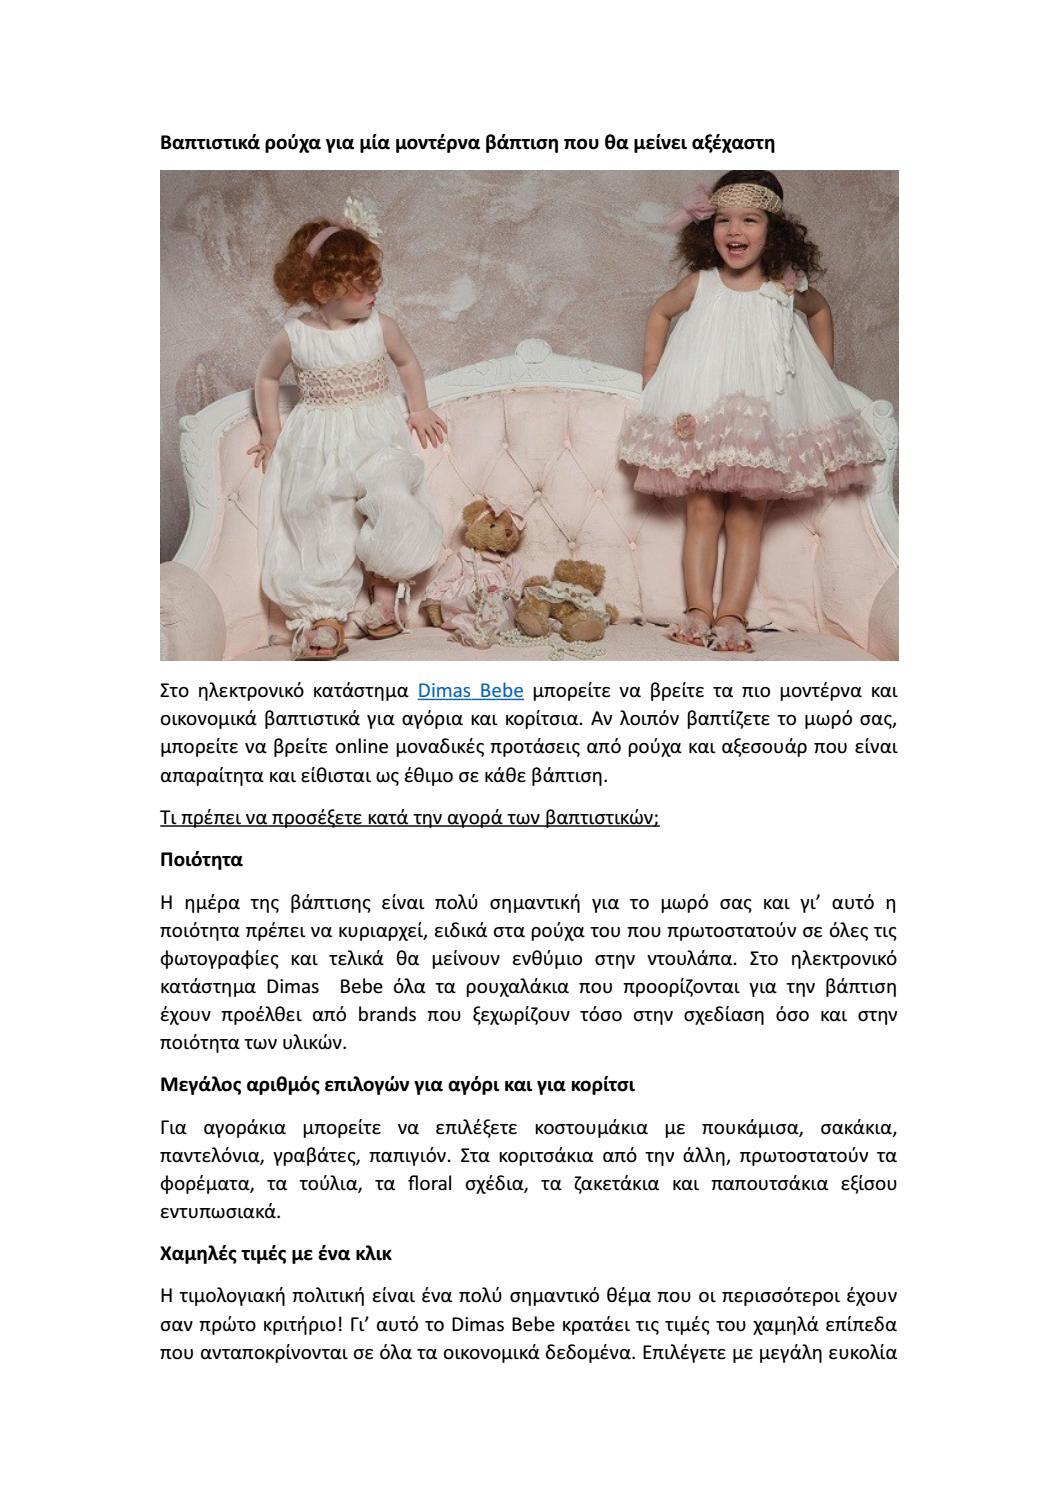 d6815d72510 Βαπτιστικά ρούχα για μία μοντέρνα βάπτιση που θα μείνει αξέχαστη by  dimas-bebe - issuu